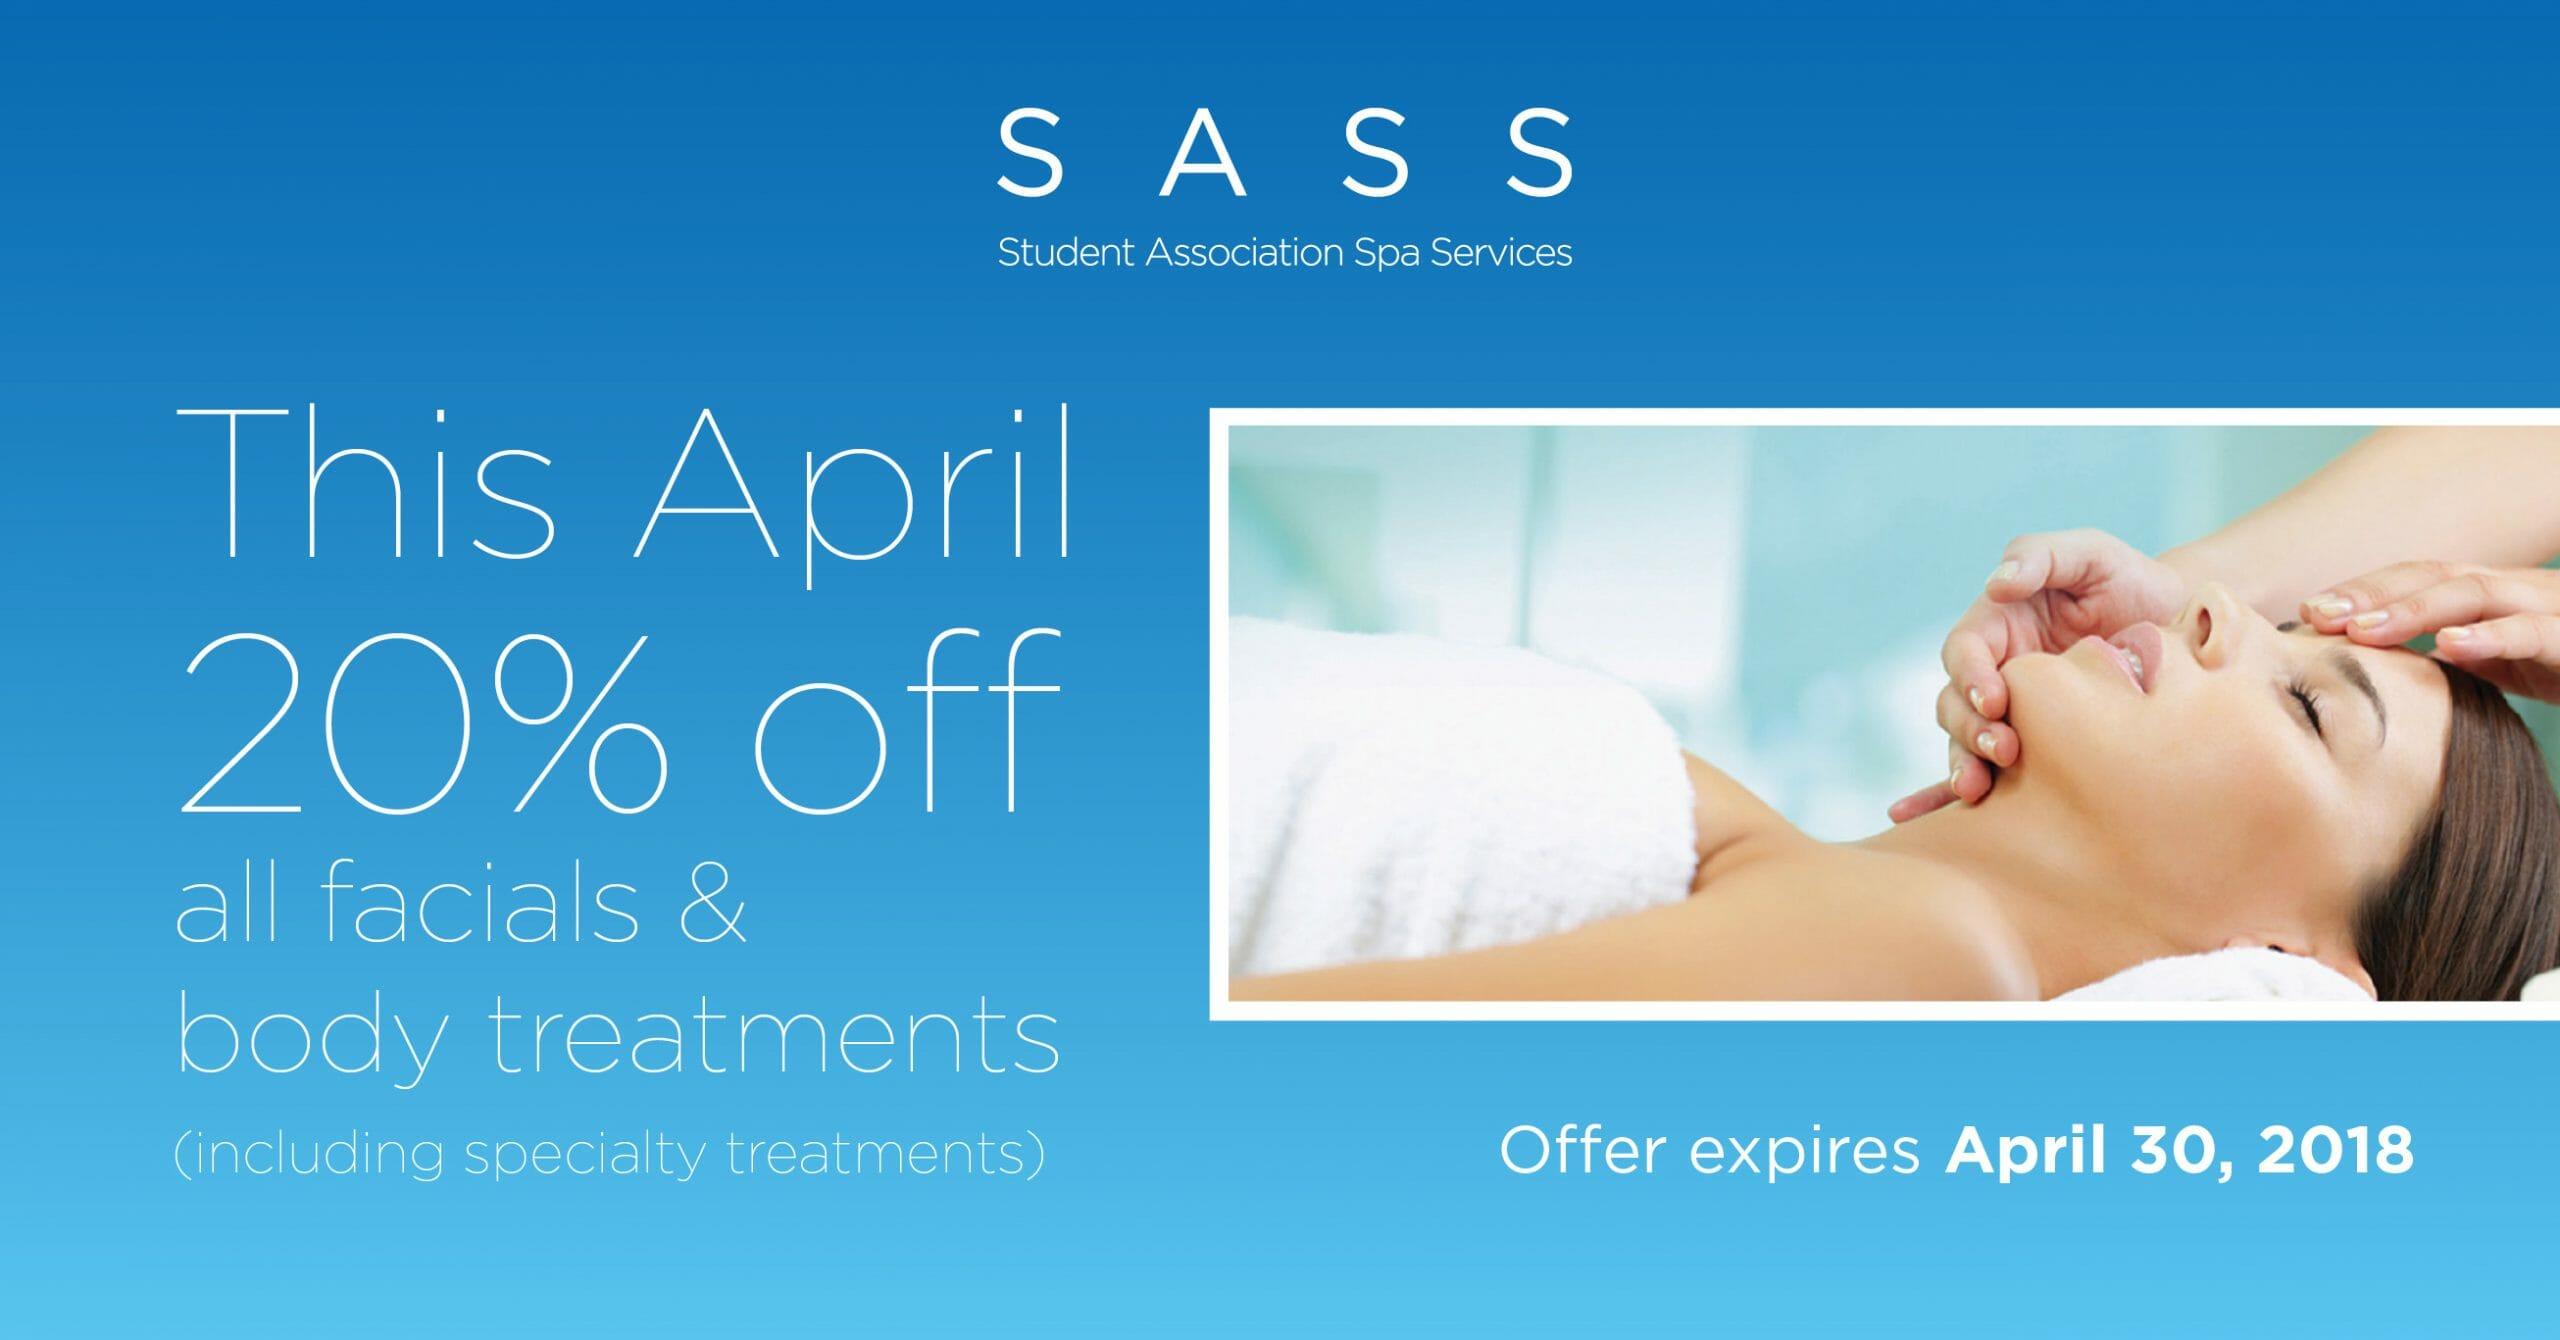 SASS spring specials